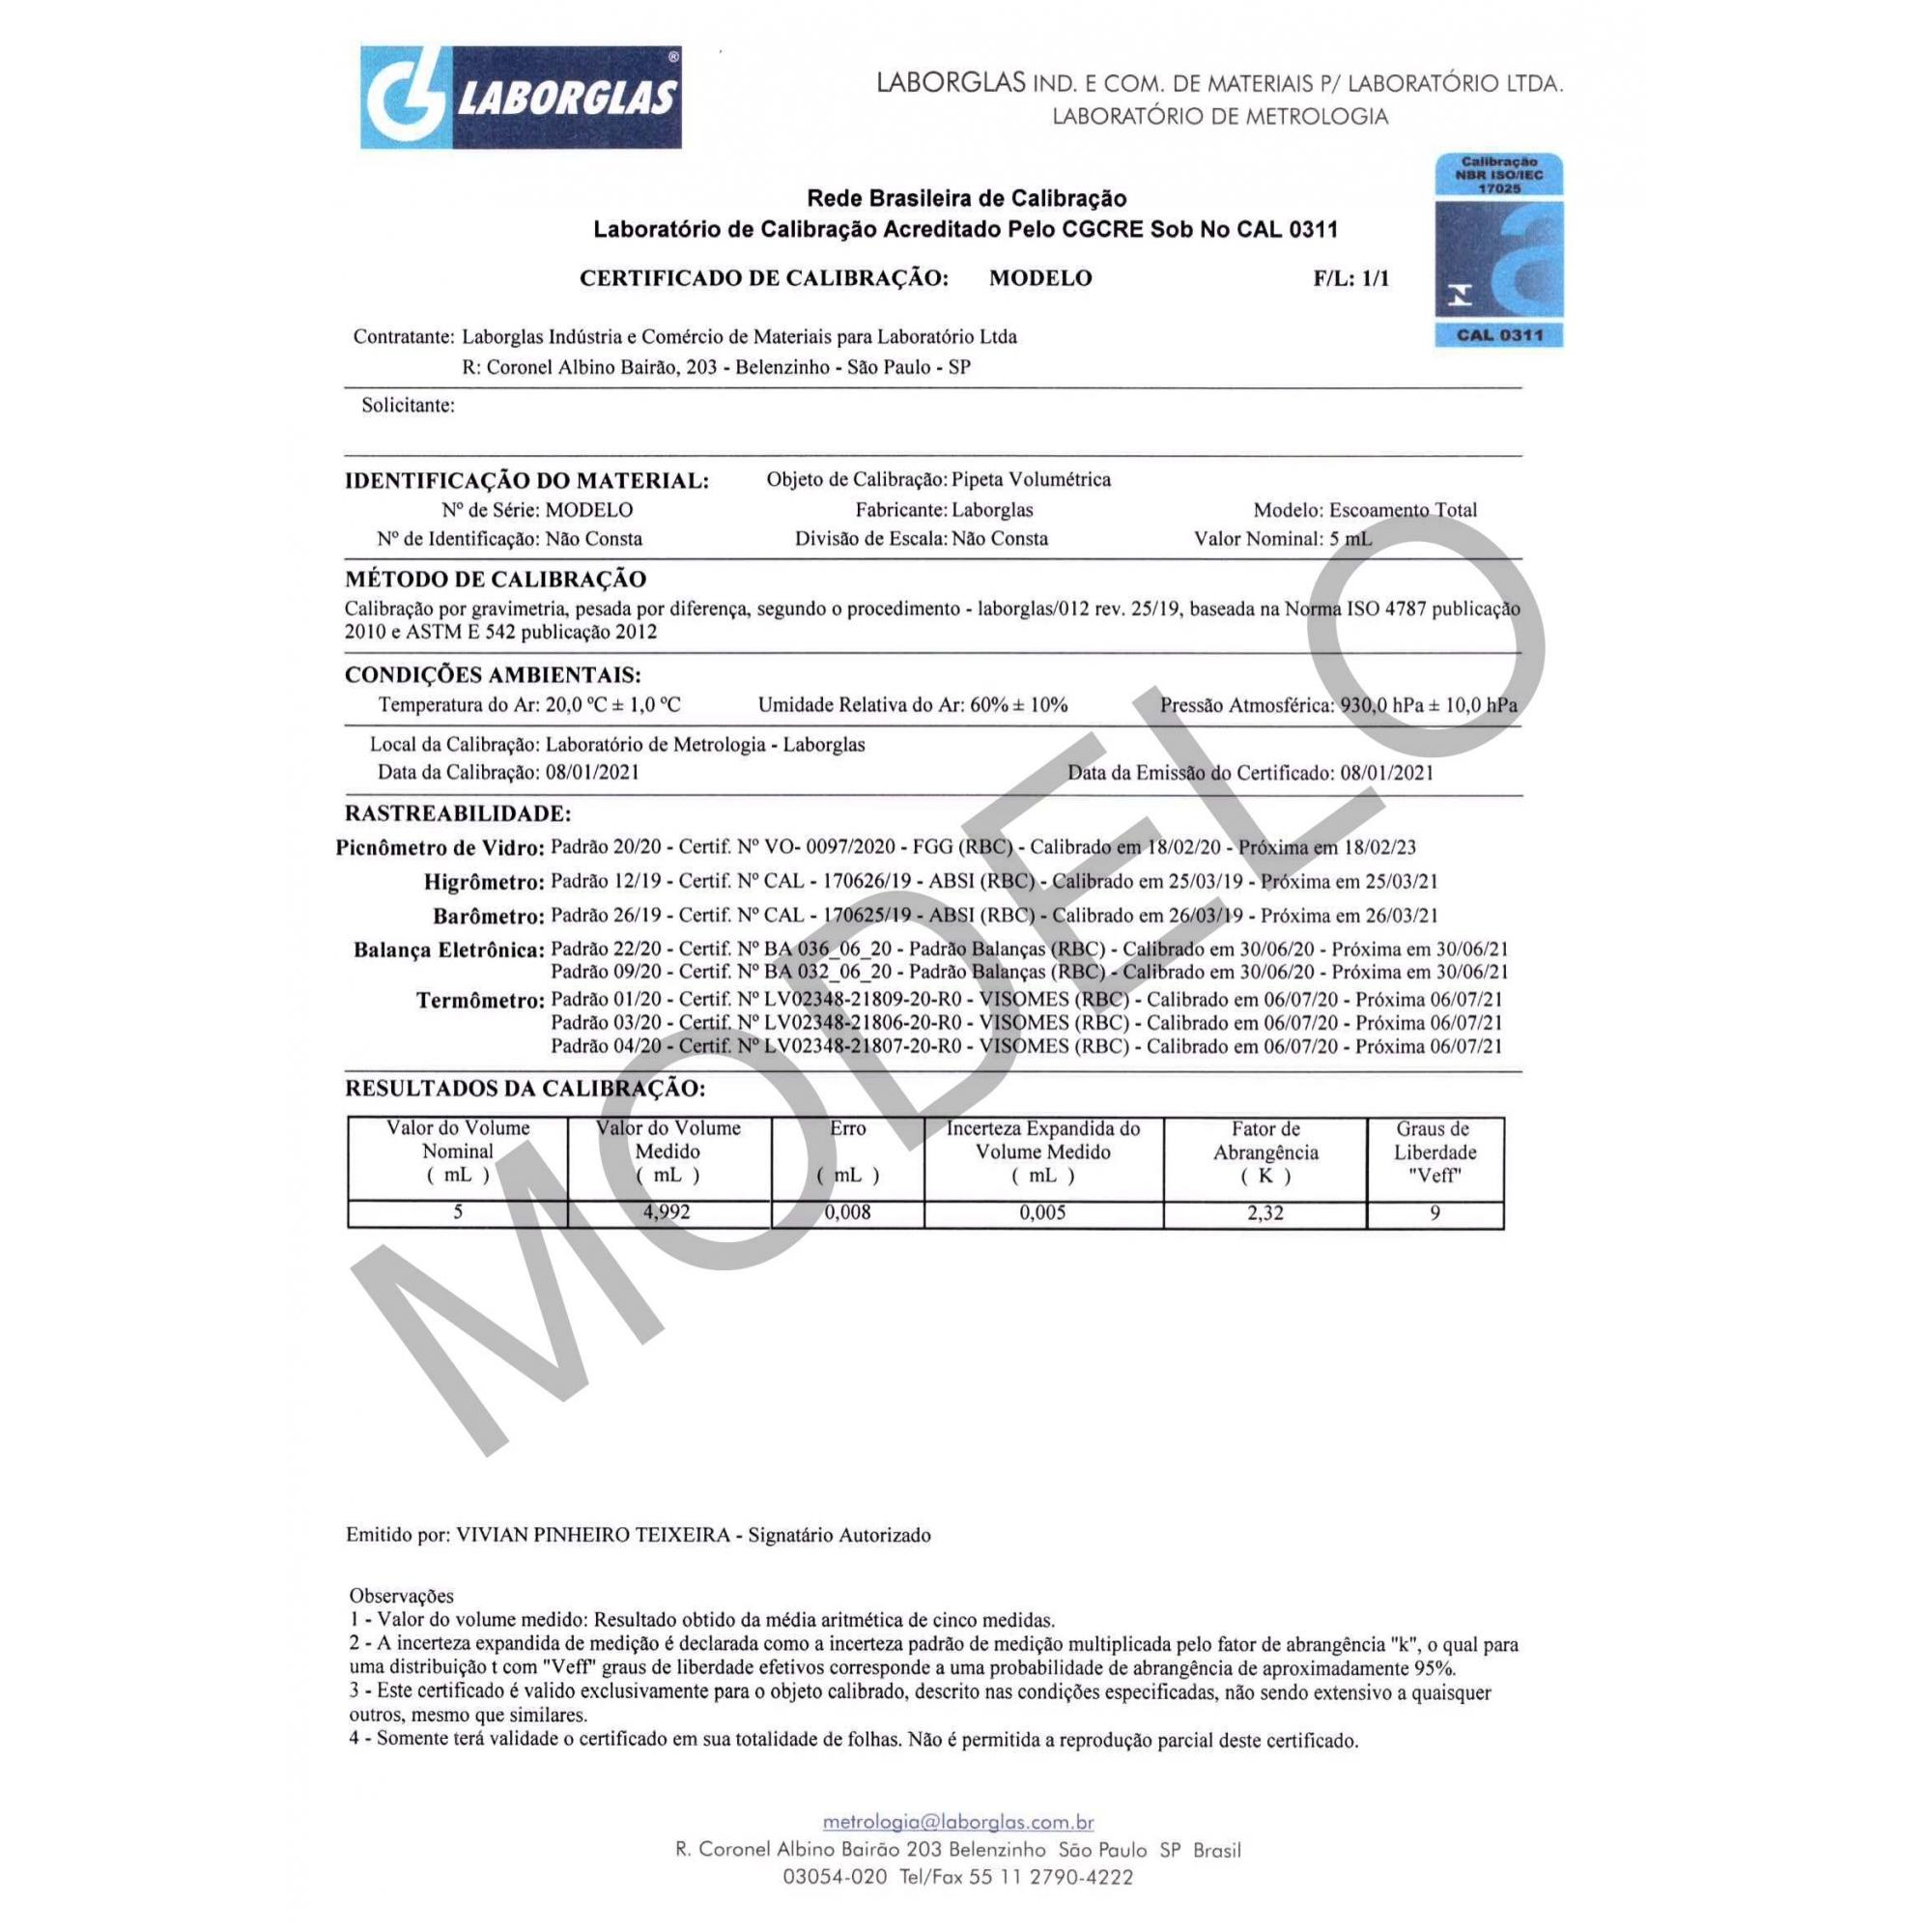 PIPETA VOLUMÉTRICA ESGOTAMENTO TOTAL 15 ML CERTIFICADO RBC - Laborglas - Cód. 9433713-R